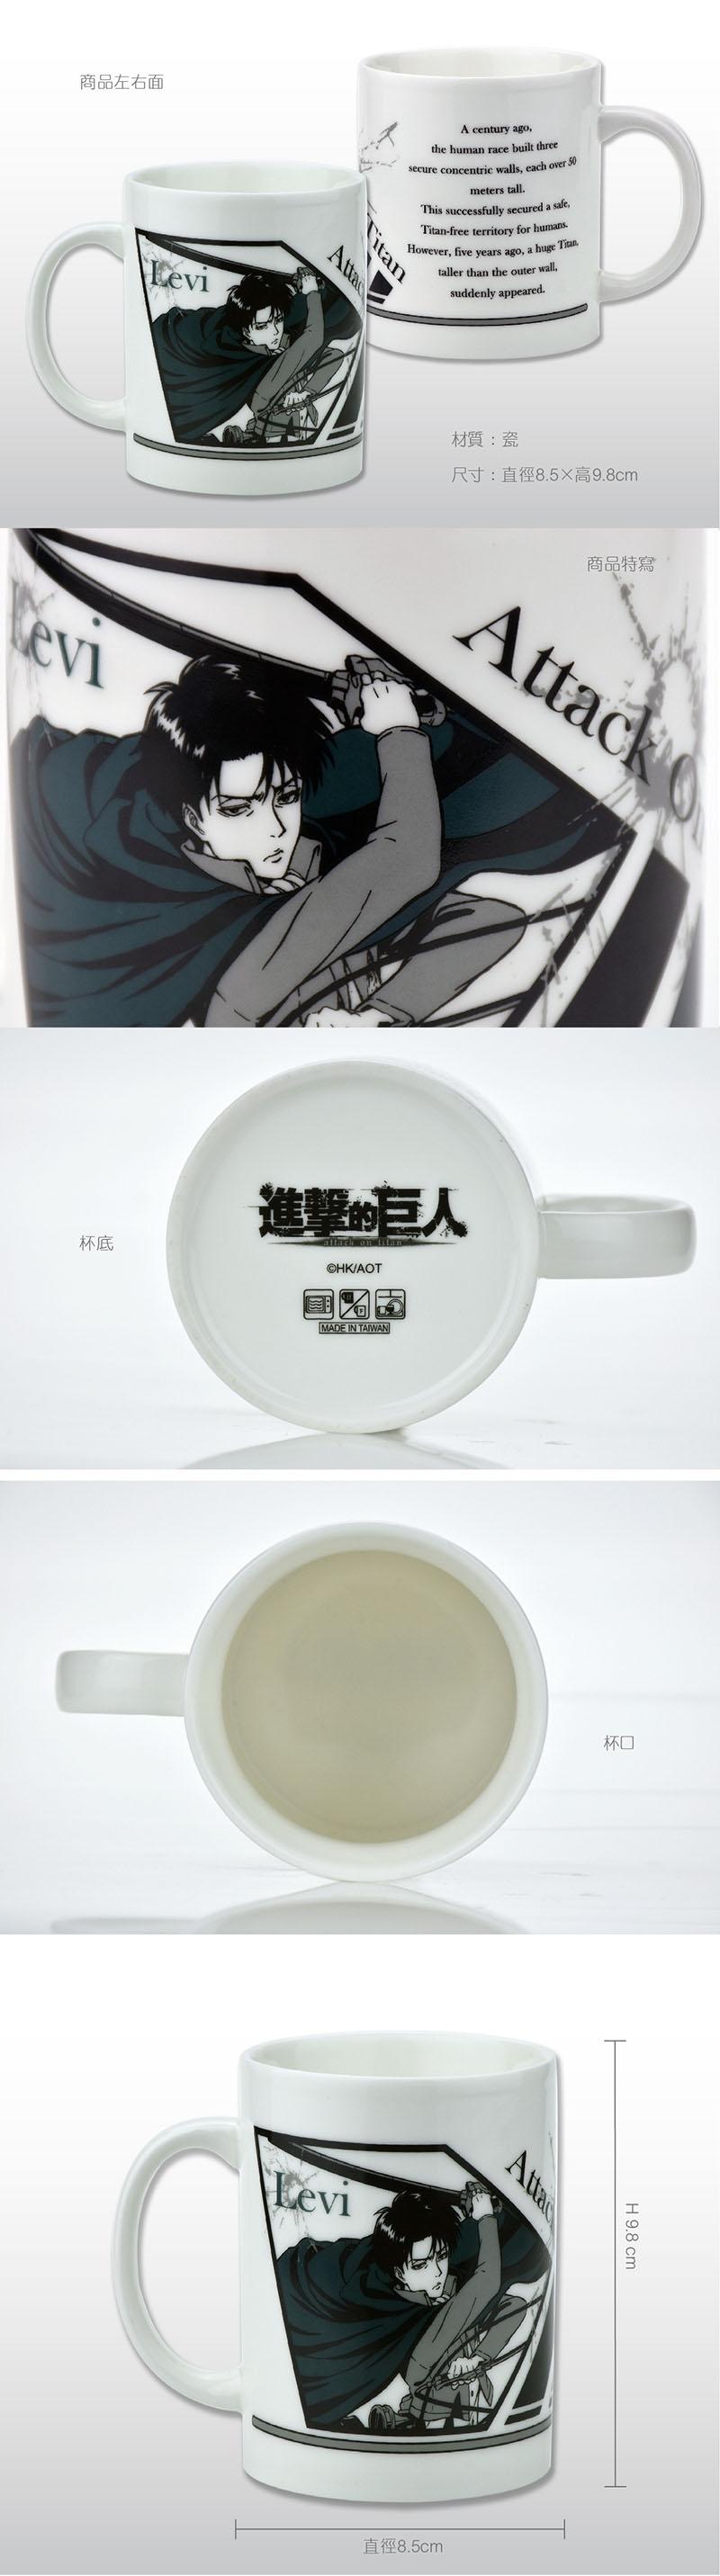 http://products.fukang.com.tw/4712926864104.jpg